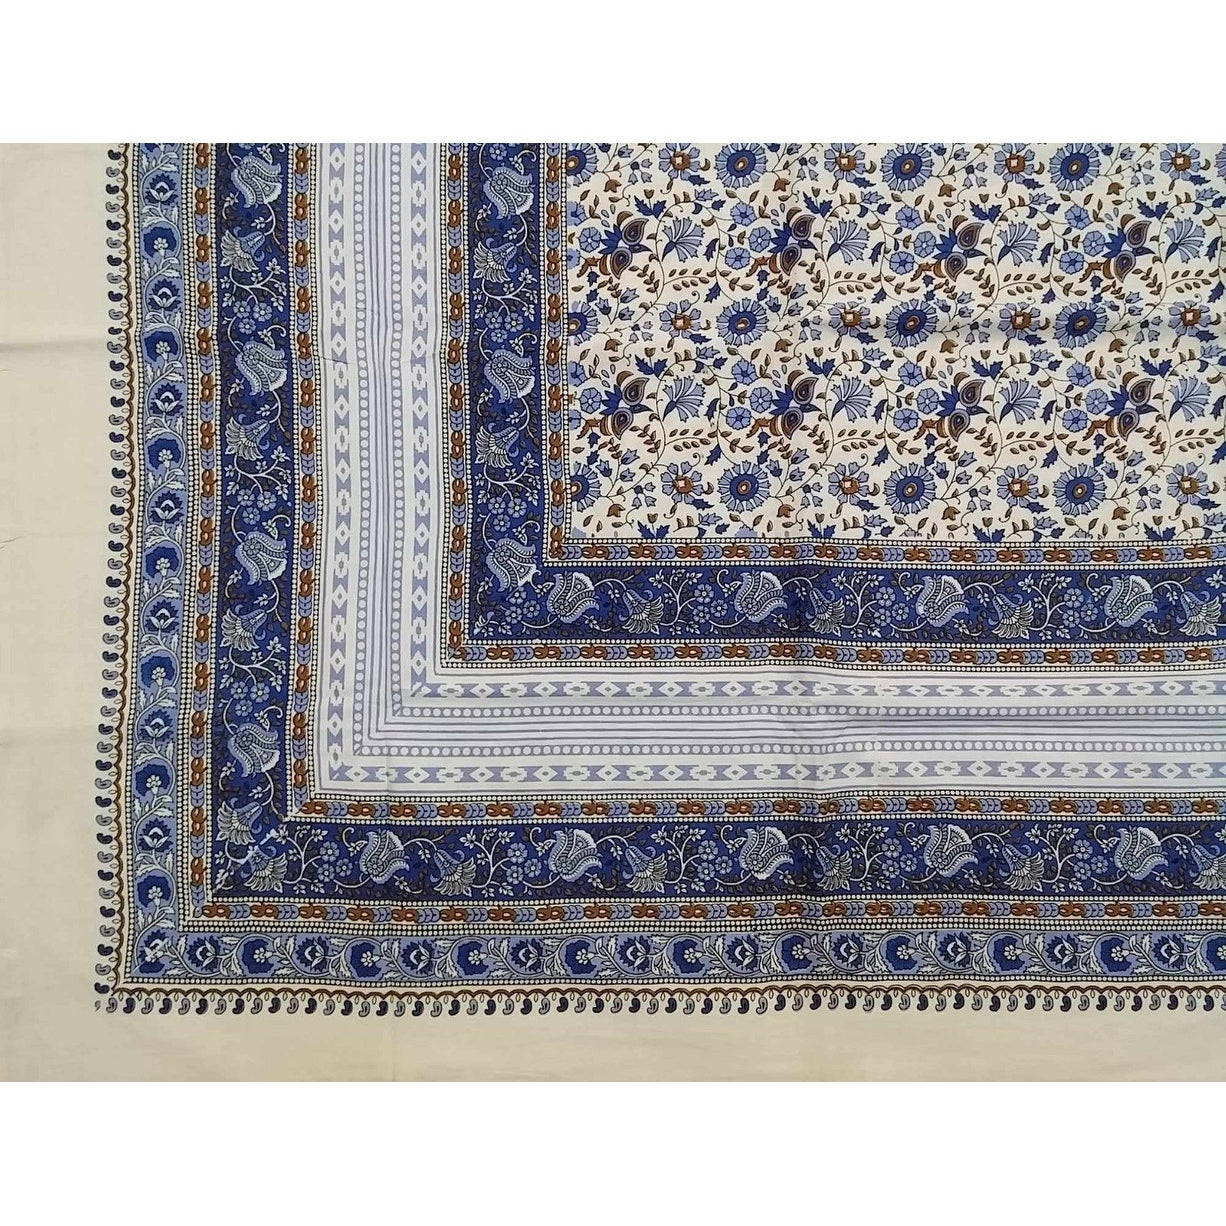 Handmade 100% Cotton Floral Tapestry Throw Tablecloth Bedspread Blue in Twin 70x106 & Full 88x106 Beach Sheet Dorm Decor - Thumbnail 0